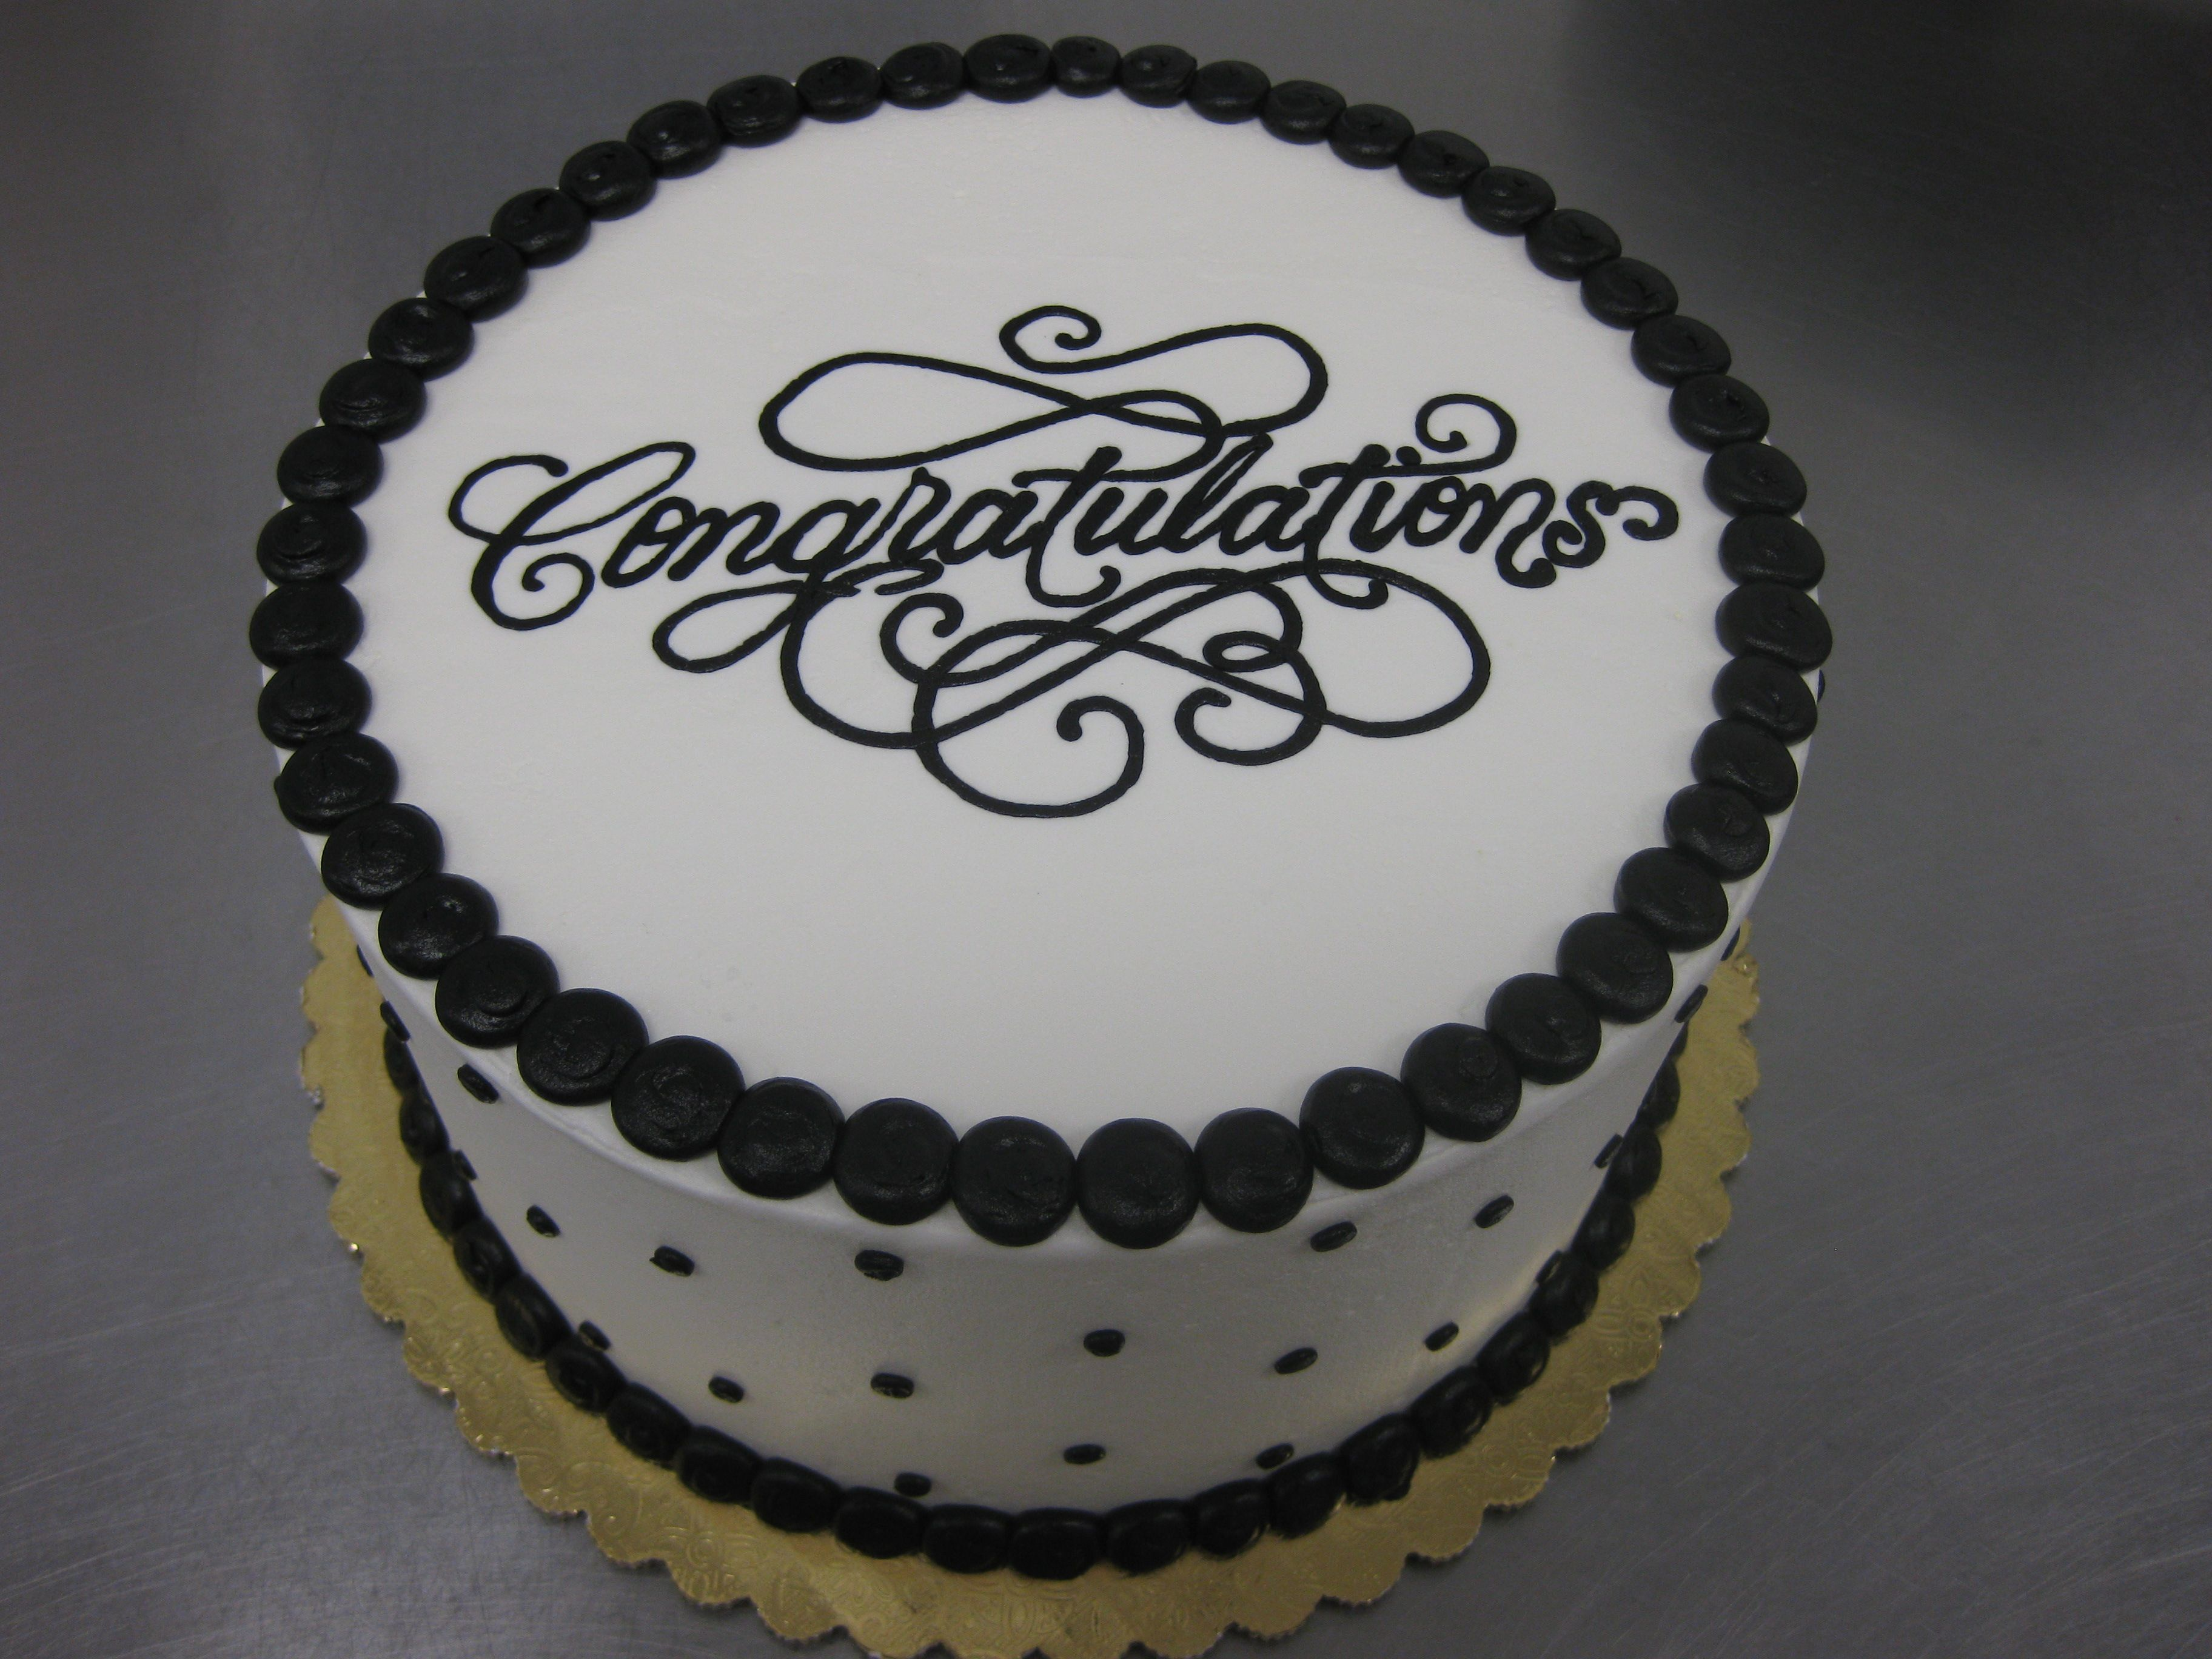 Congratulations Cake With Images Congratulations Cake